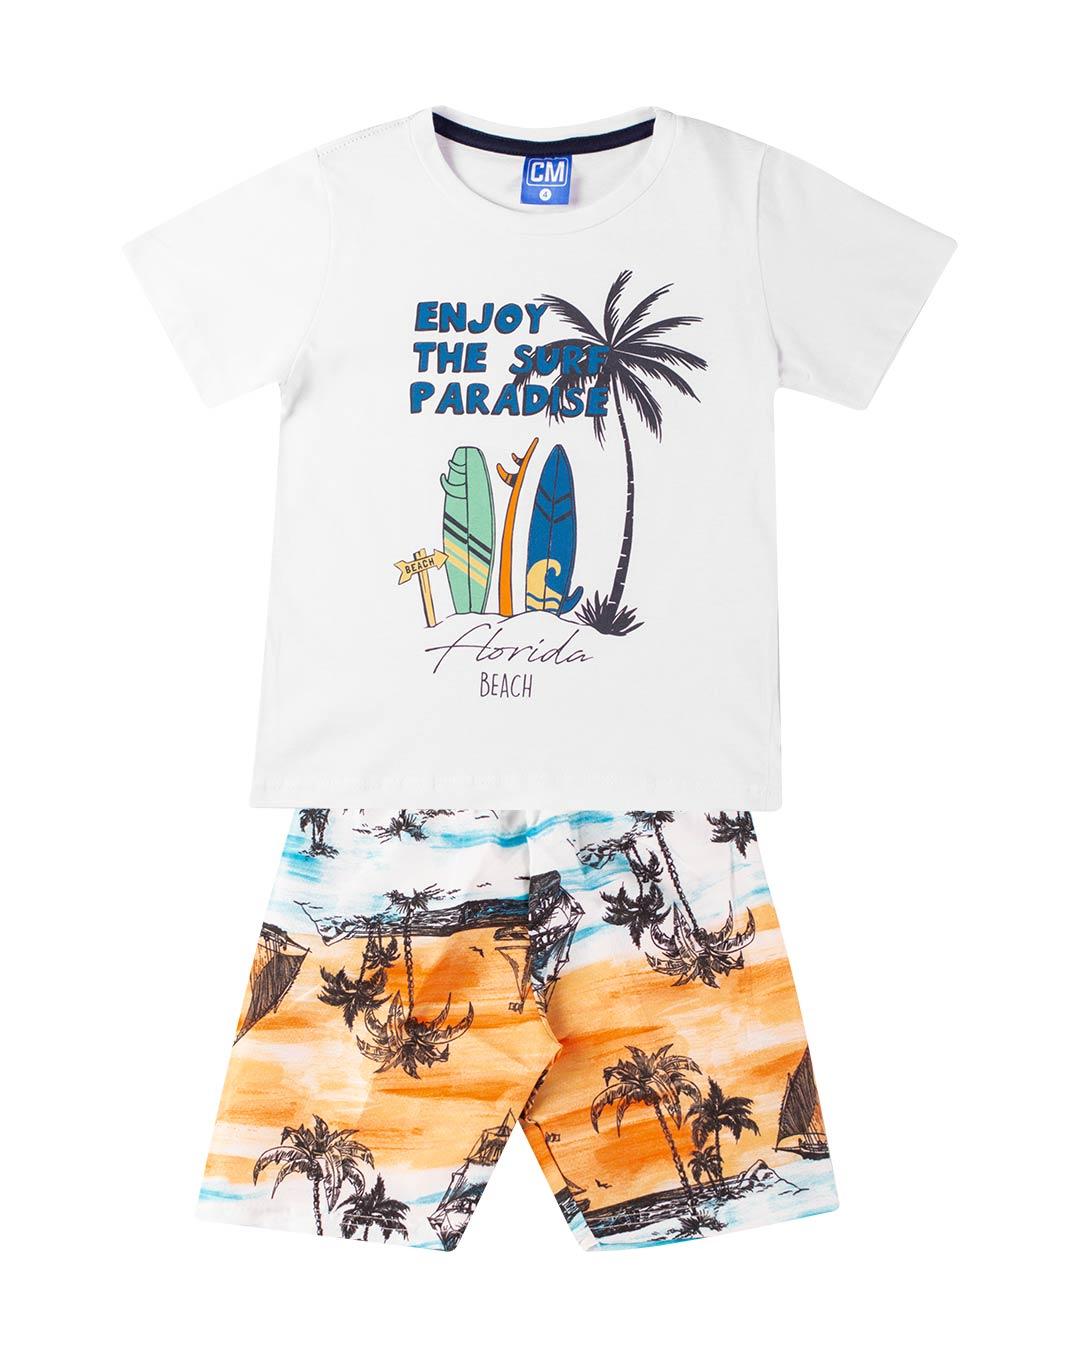 Conjunto Infantil Enjoy the Surf Branco - Cara Metade